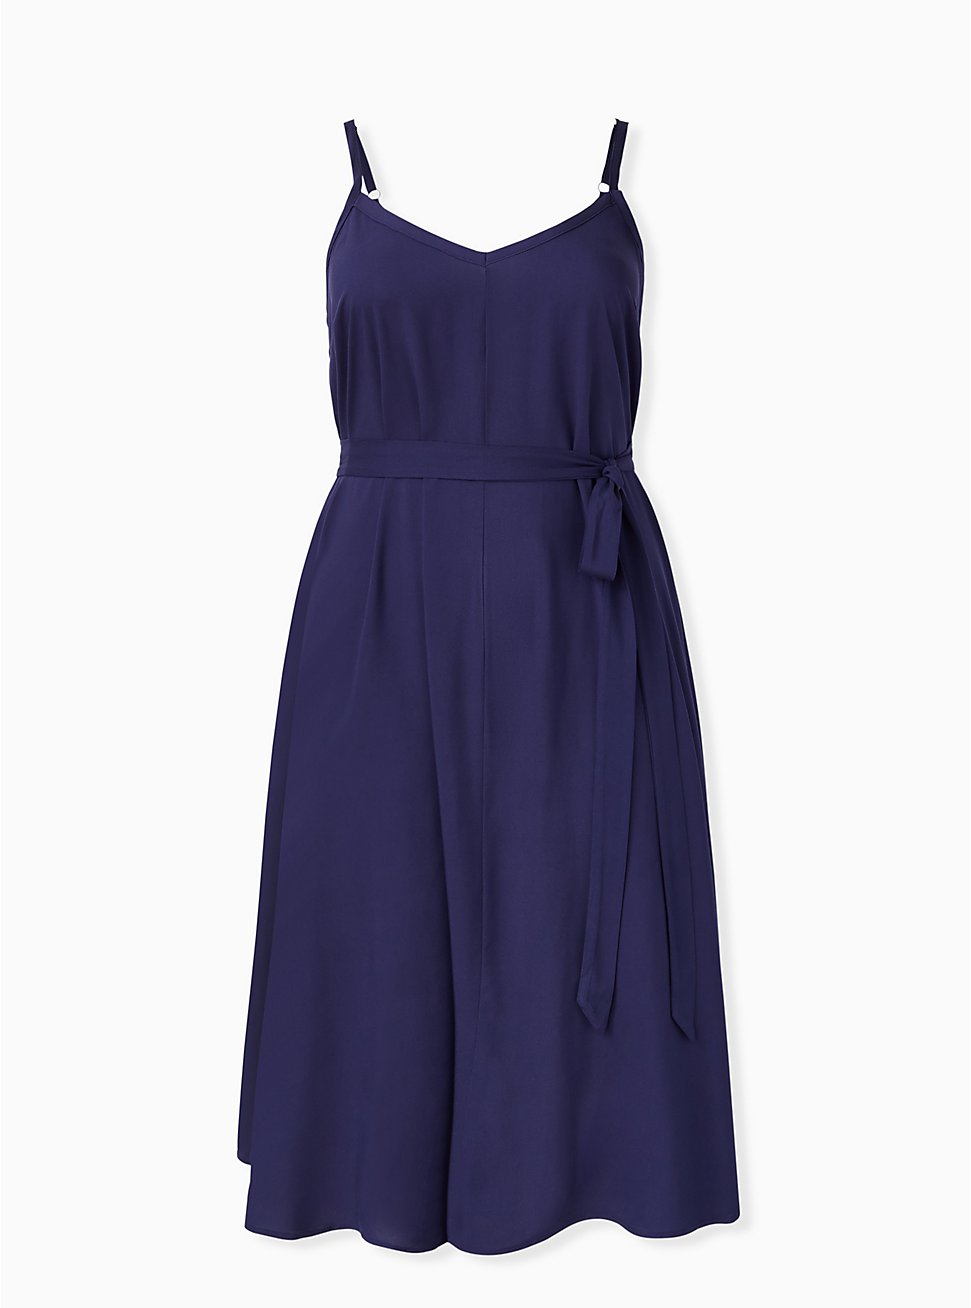 Navy Self Tie Midi Trapeze Dress, PEACOAT, hi-res